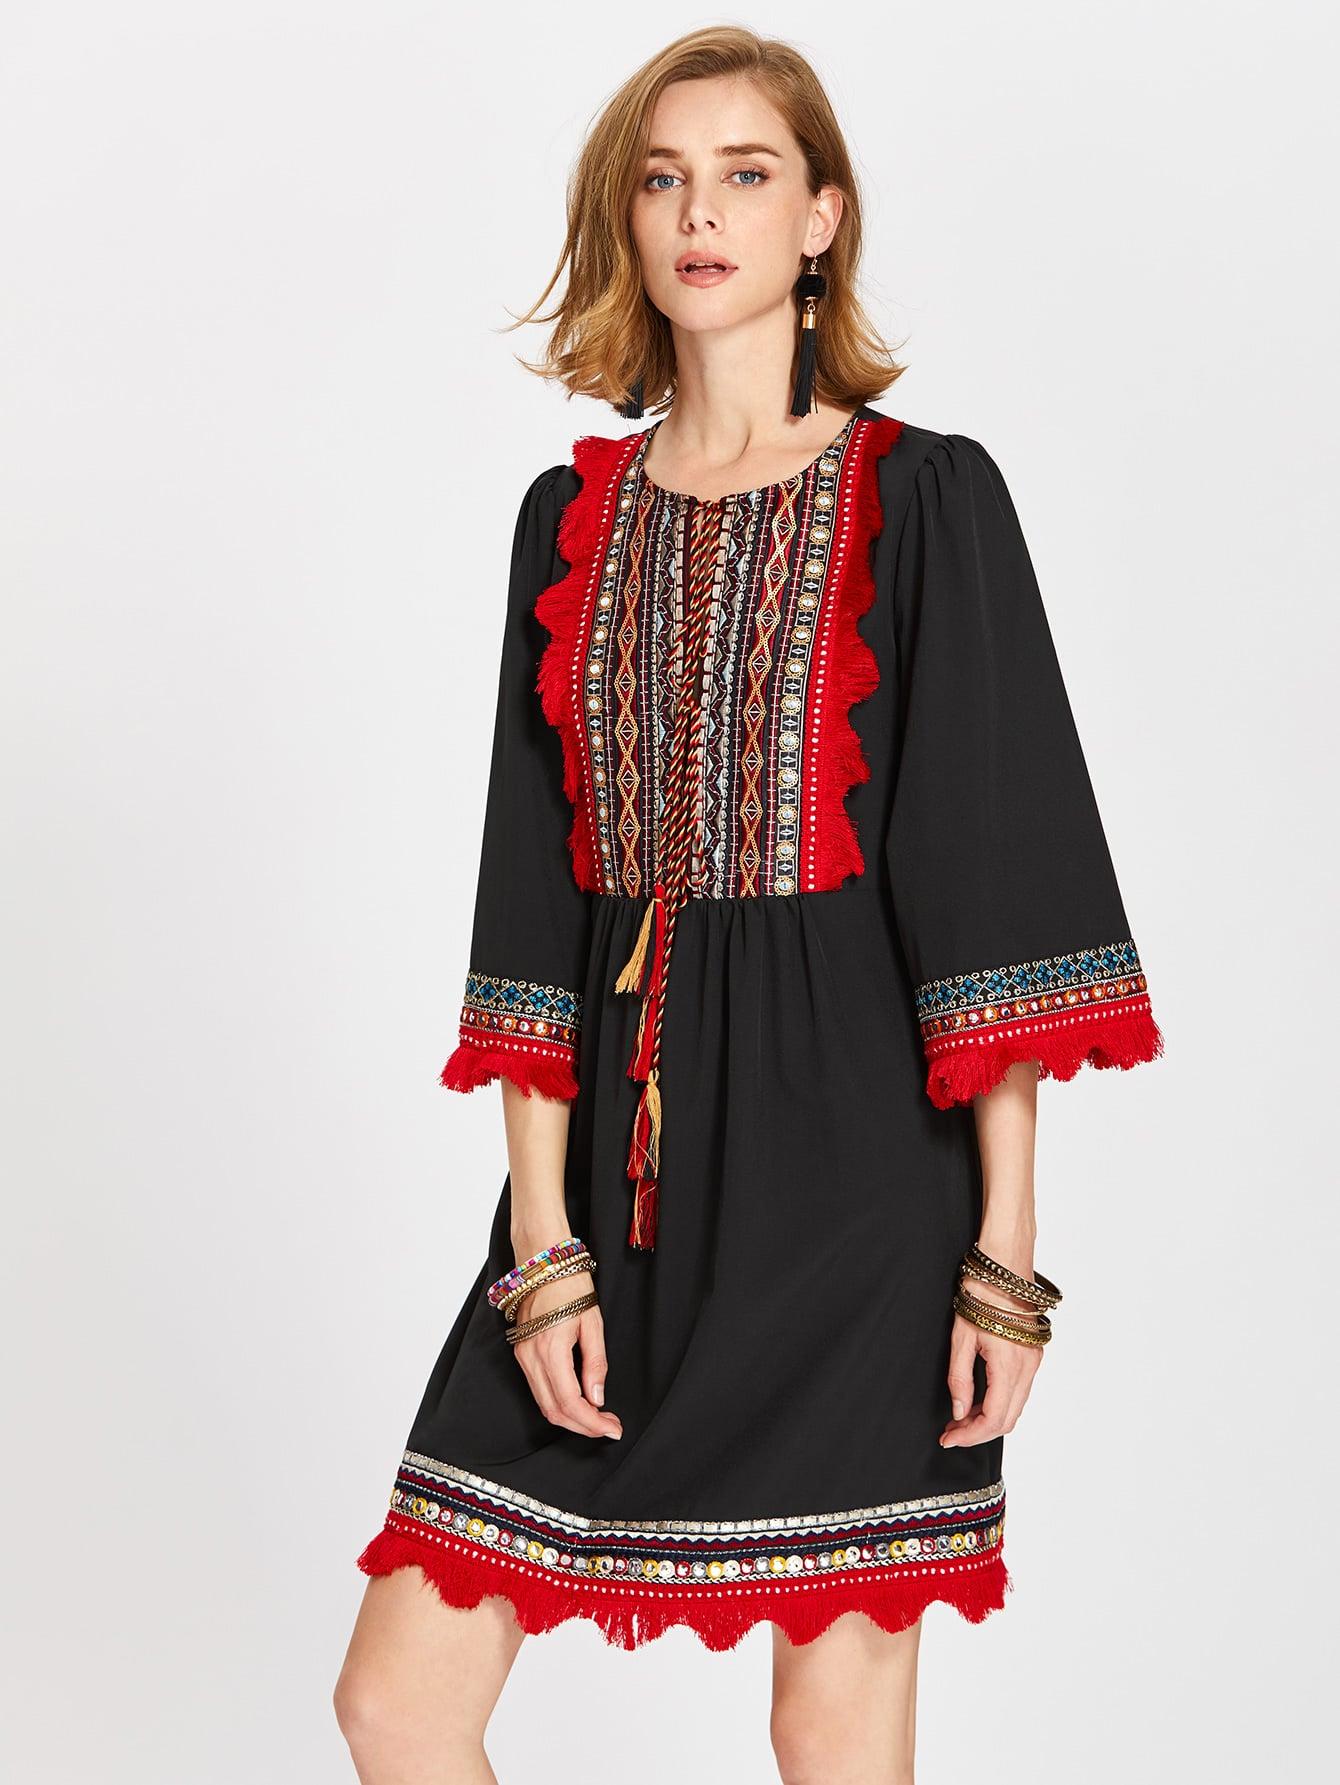 Tasseled Tie Fringe Lace Trim Embroidery Detail Dress dress170629703